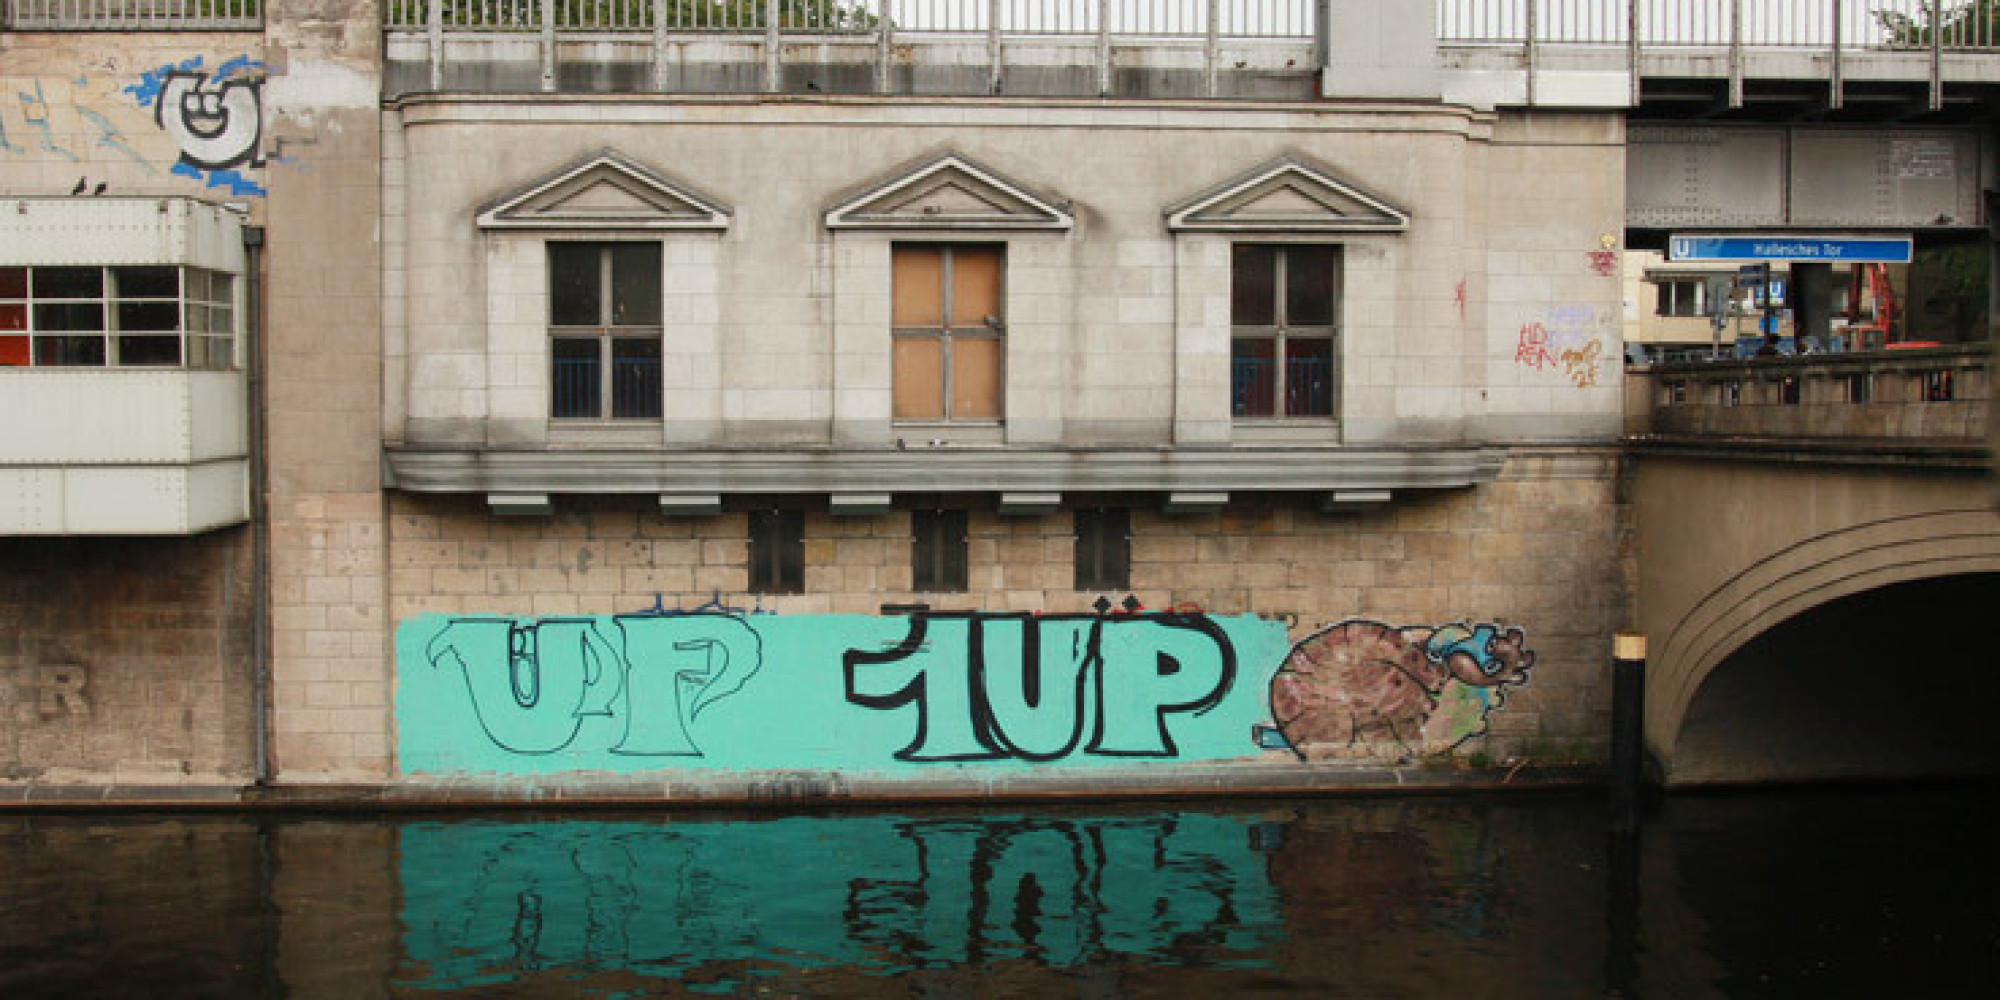 1UP In Berlin: 'All Ci...